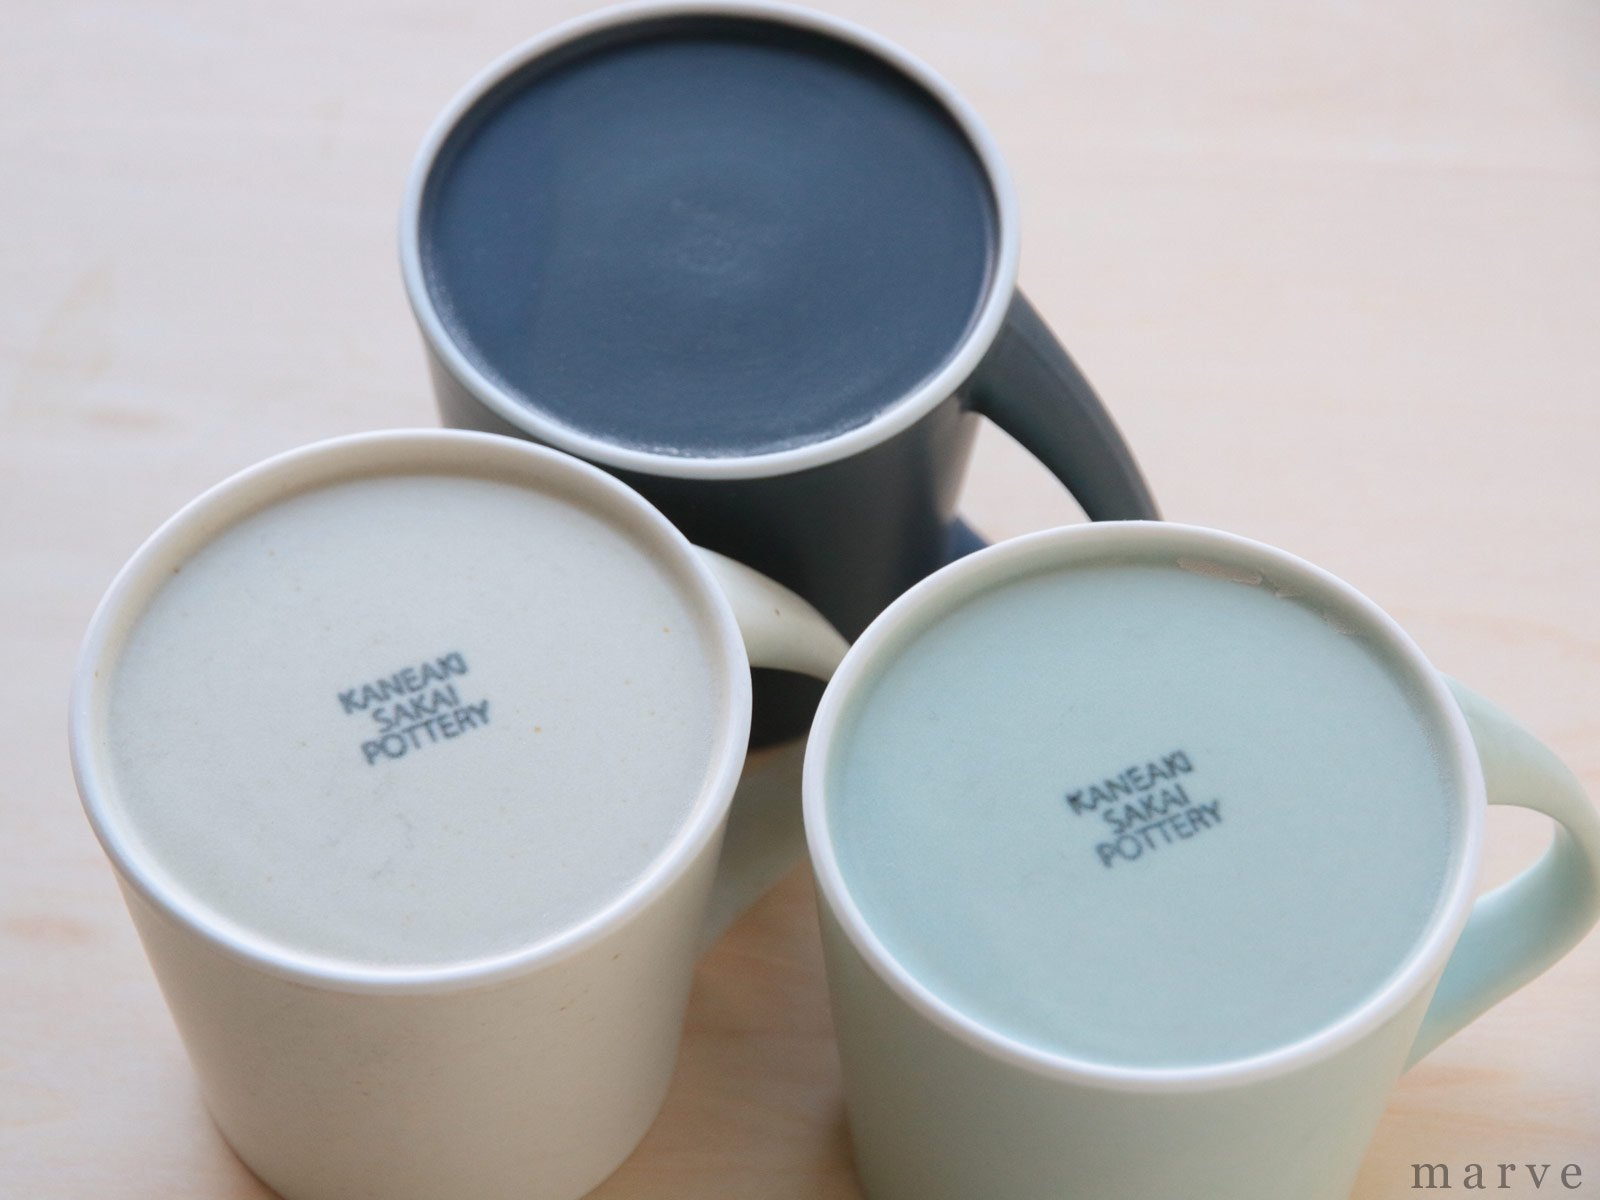 KANEAKI SAKAI POTTERY flat L mug(Lマグ) アイボリー